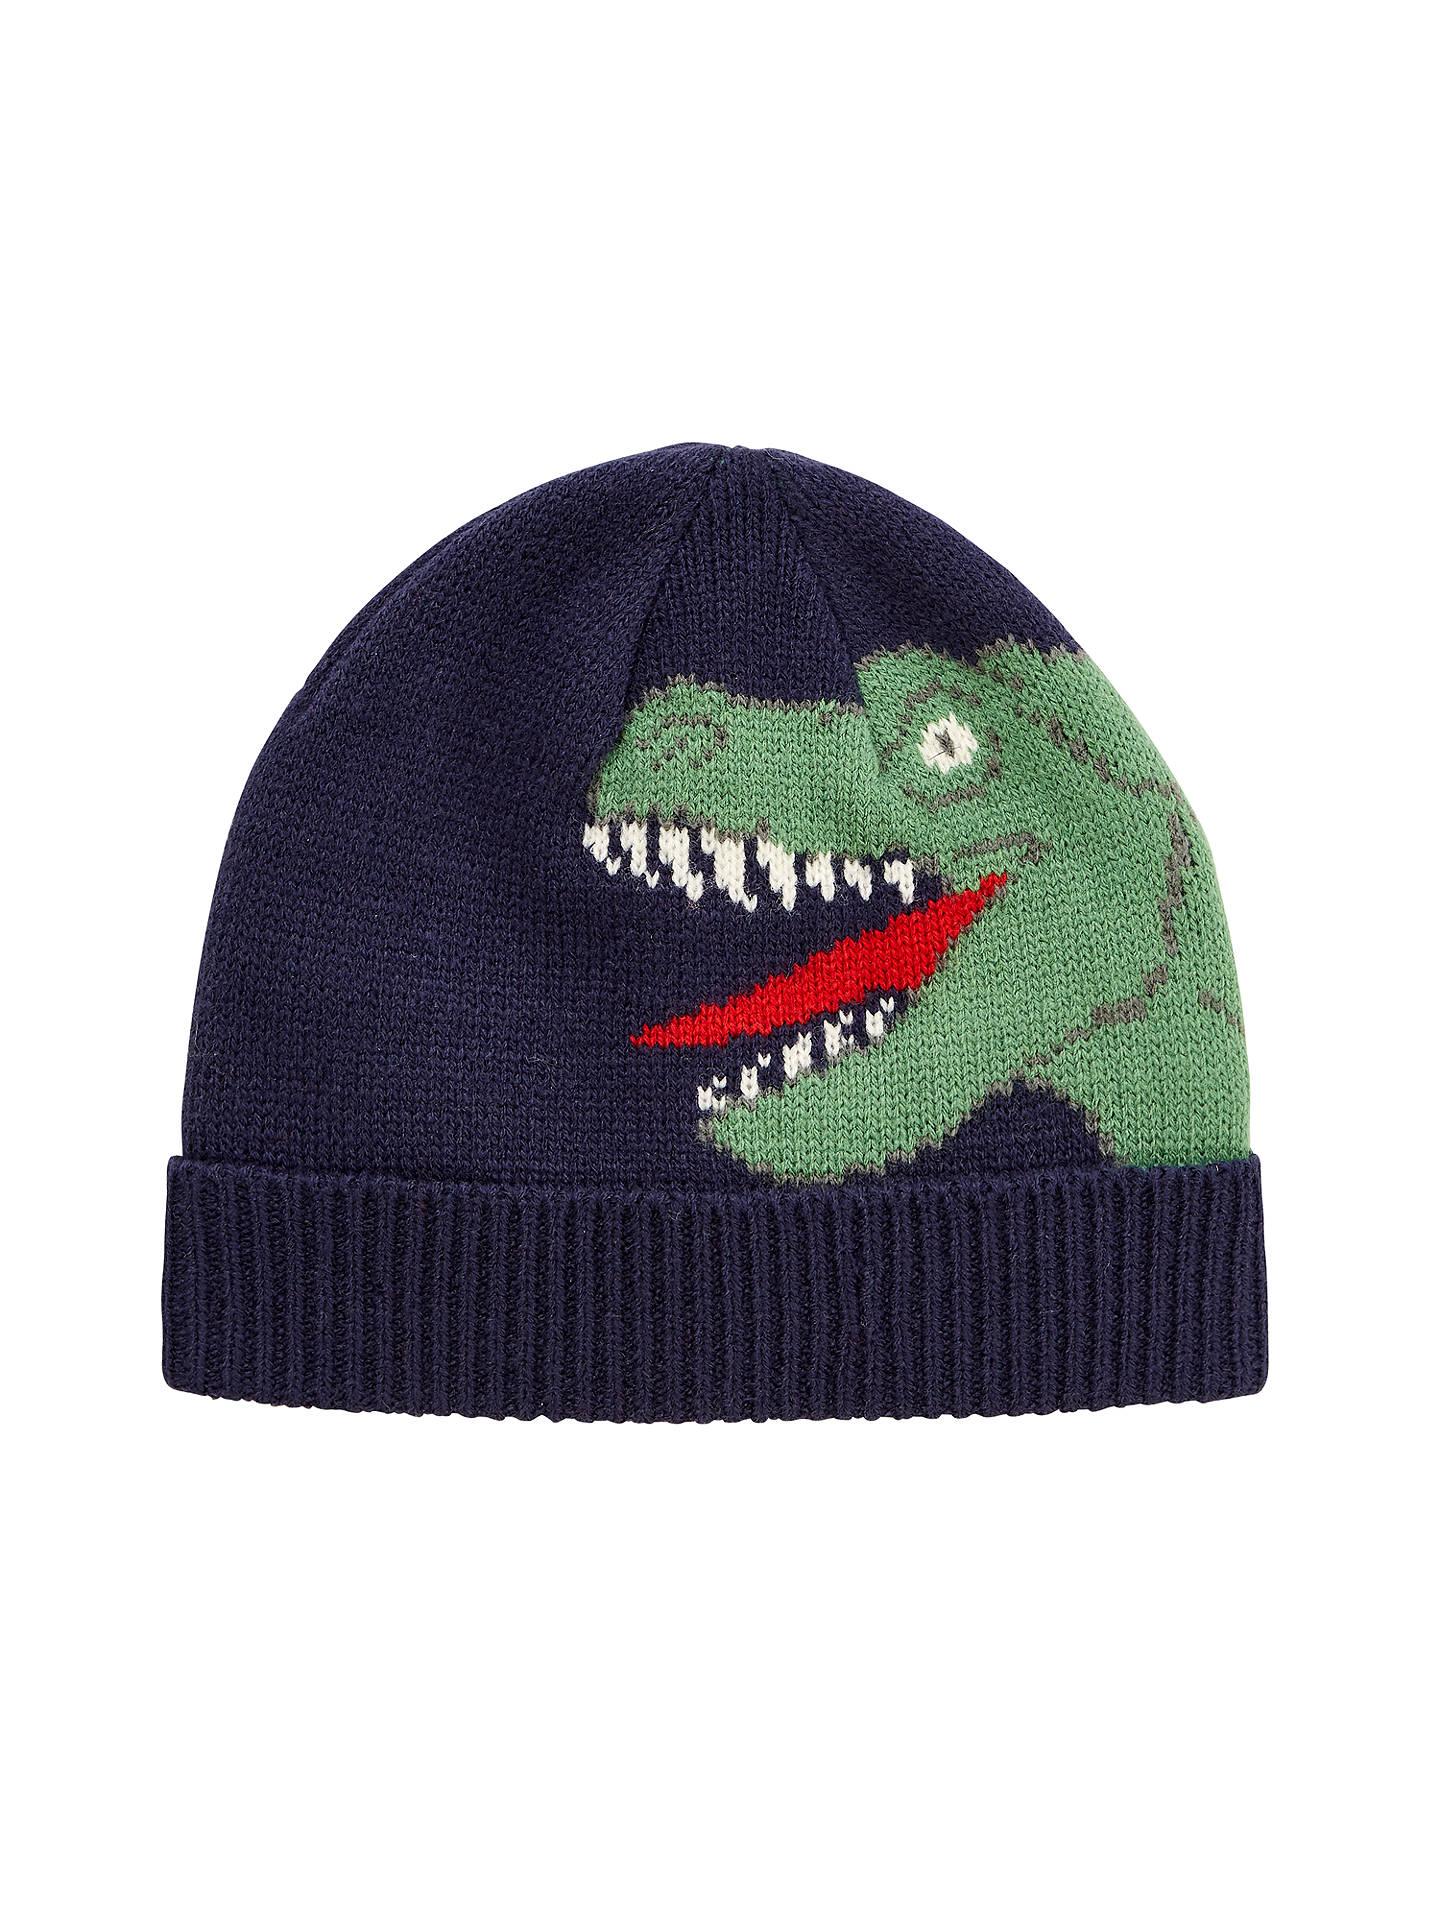 BuyJohn Lewis Children s Dinosaur Beanie Hat f4148b6a39e